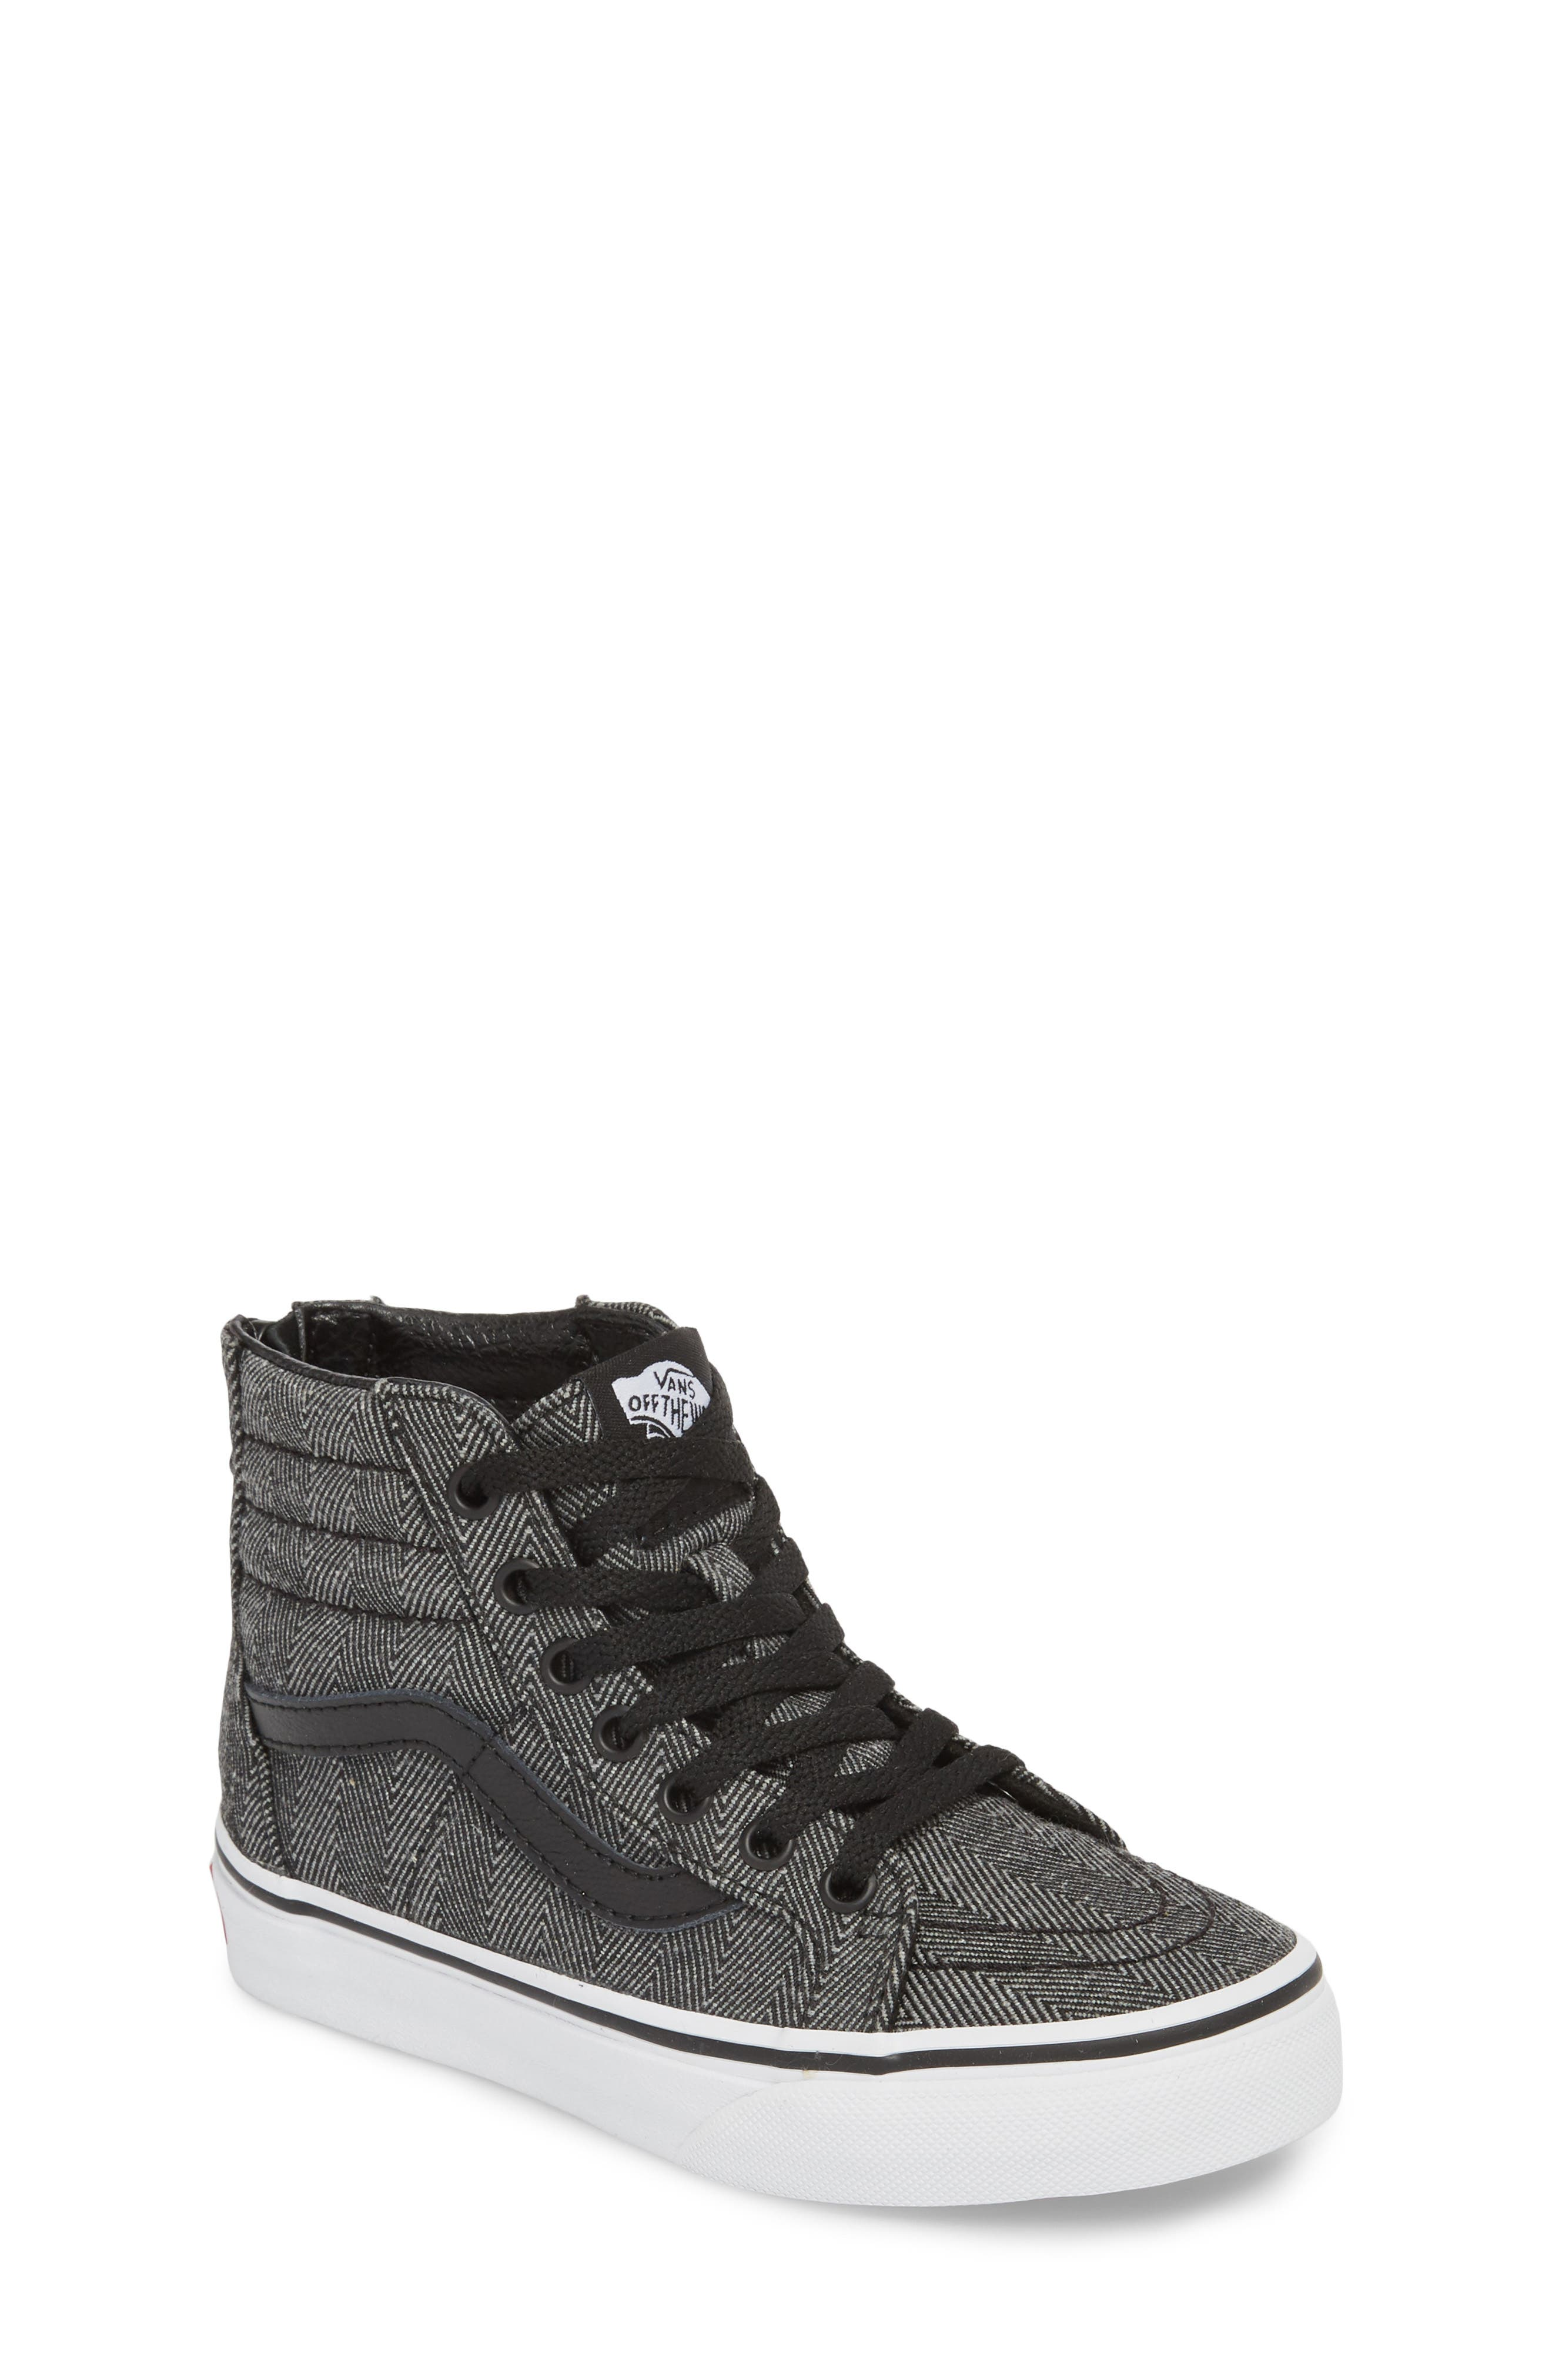 'Sk8-Hi' Sneaker,                         Main,                         color, HERRINGBONE BLACK/ TRUE WHITE